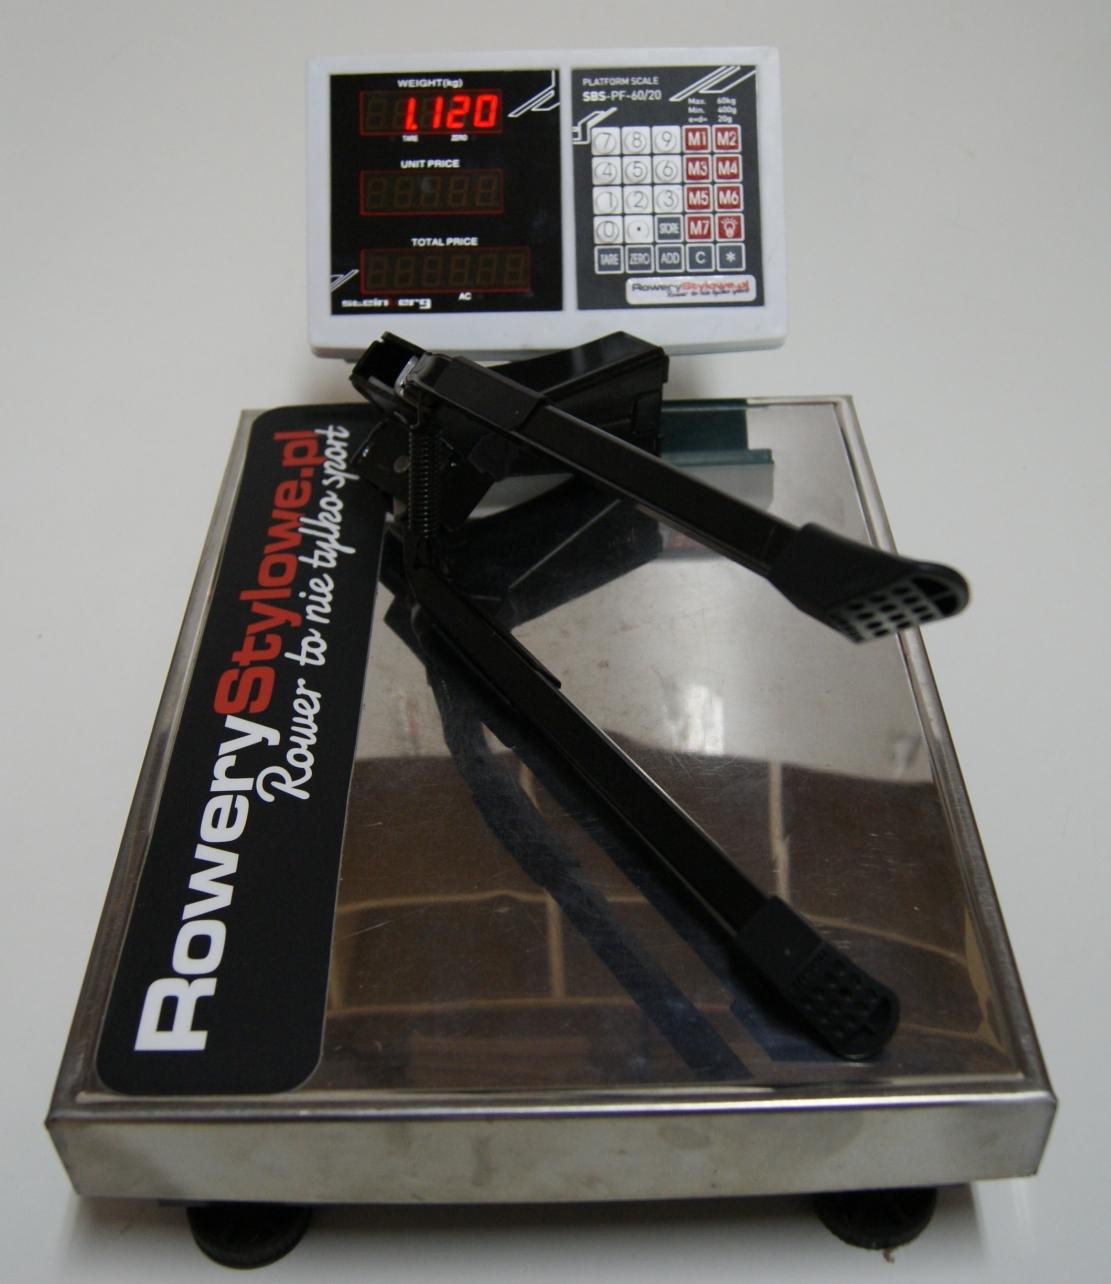 Nóżka rowerowa dwustronna URSUS Hopper - do 50 kg waga 1120 gram